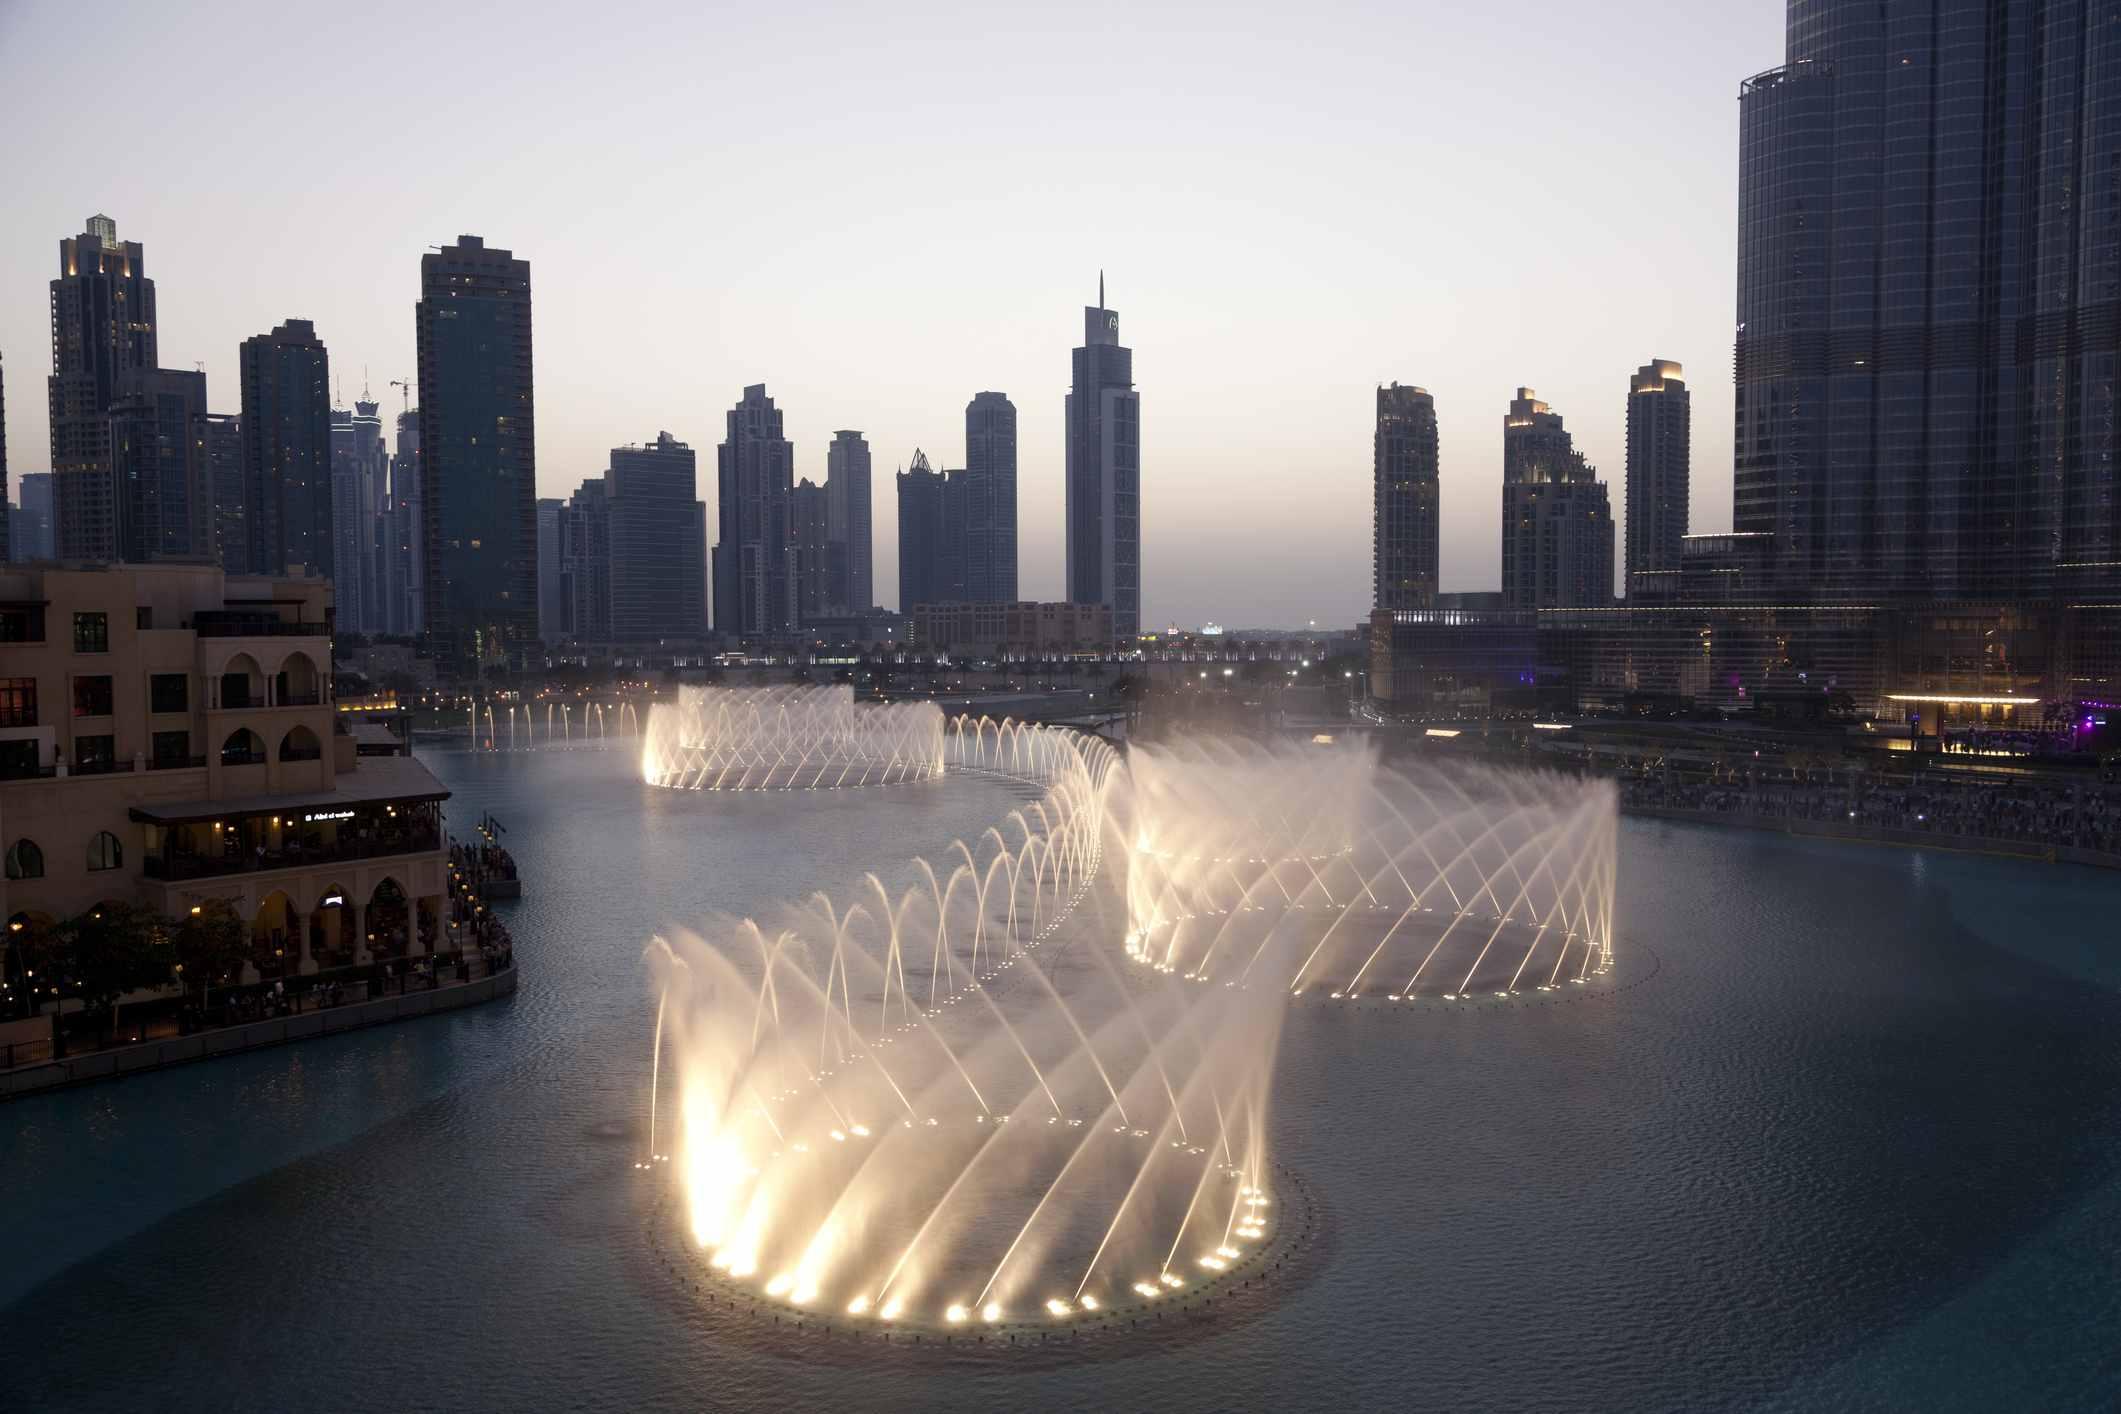 Burj Khalifa Lake, fountain and city skyline